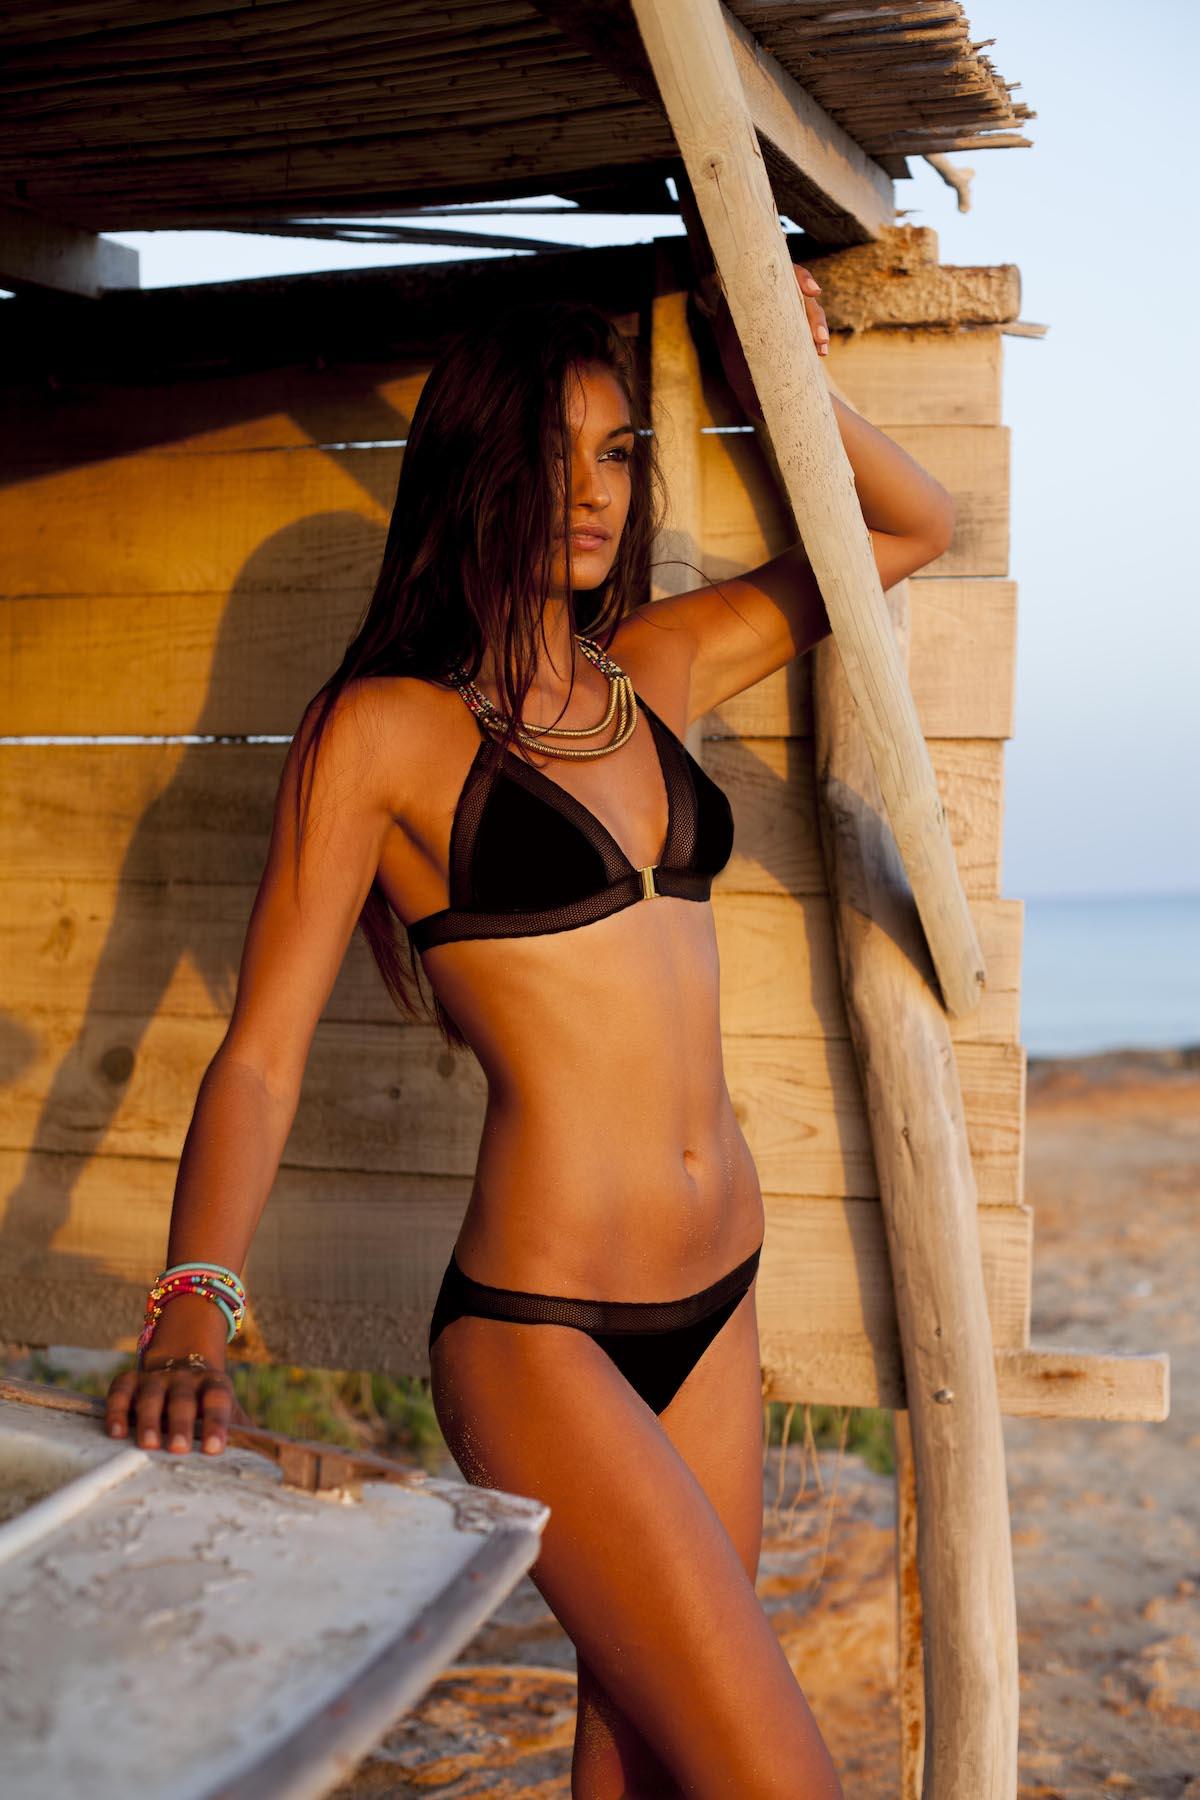 fernanda-black-top-lifestyle-